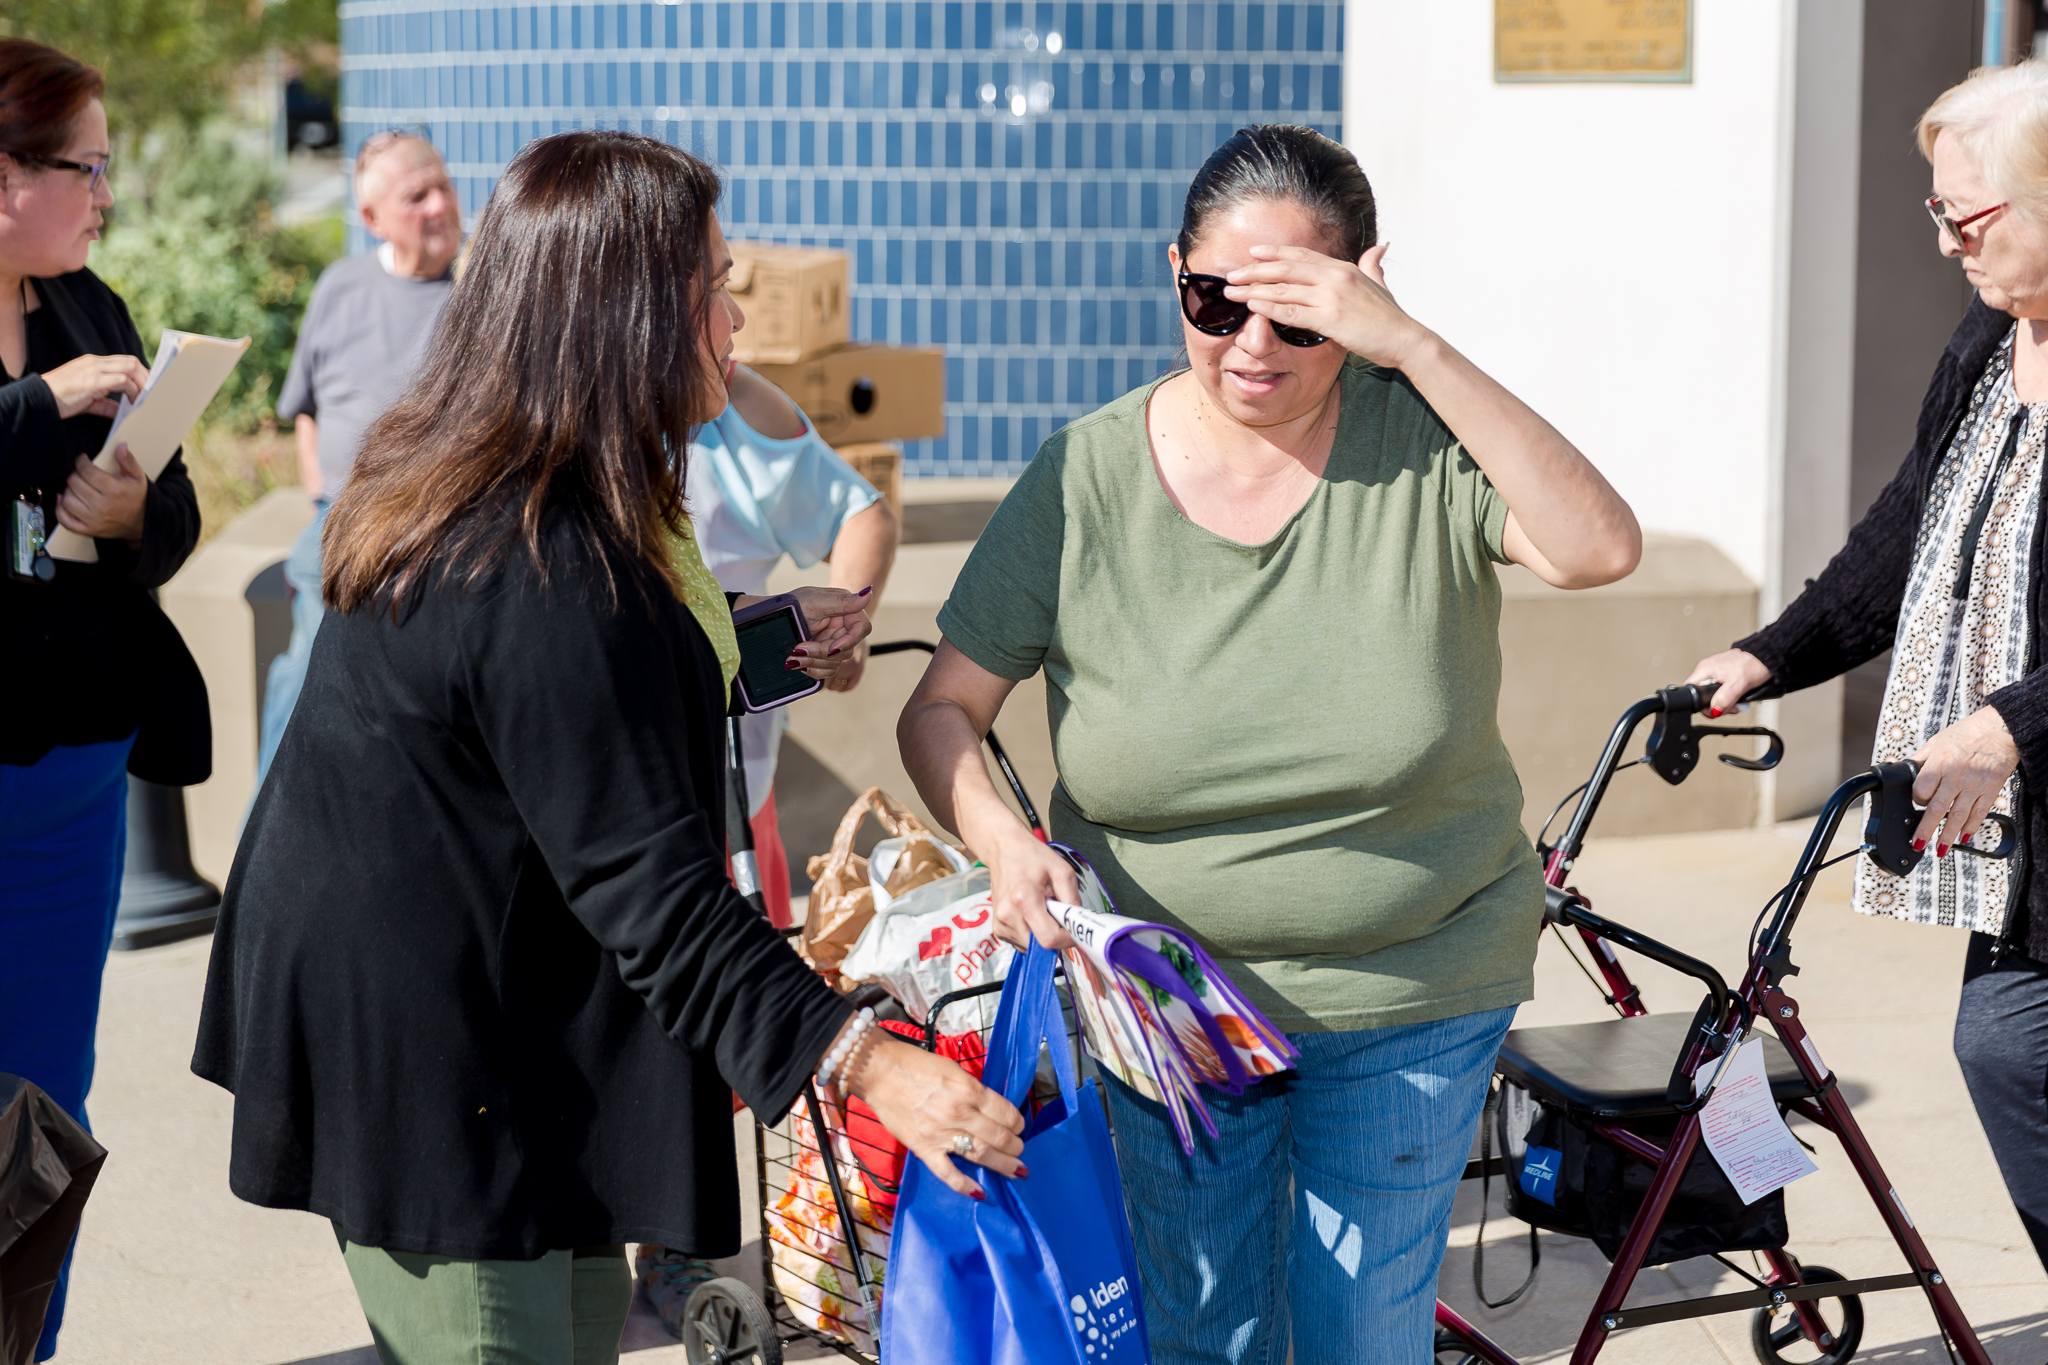 Council Member Angie English distributing turkey